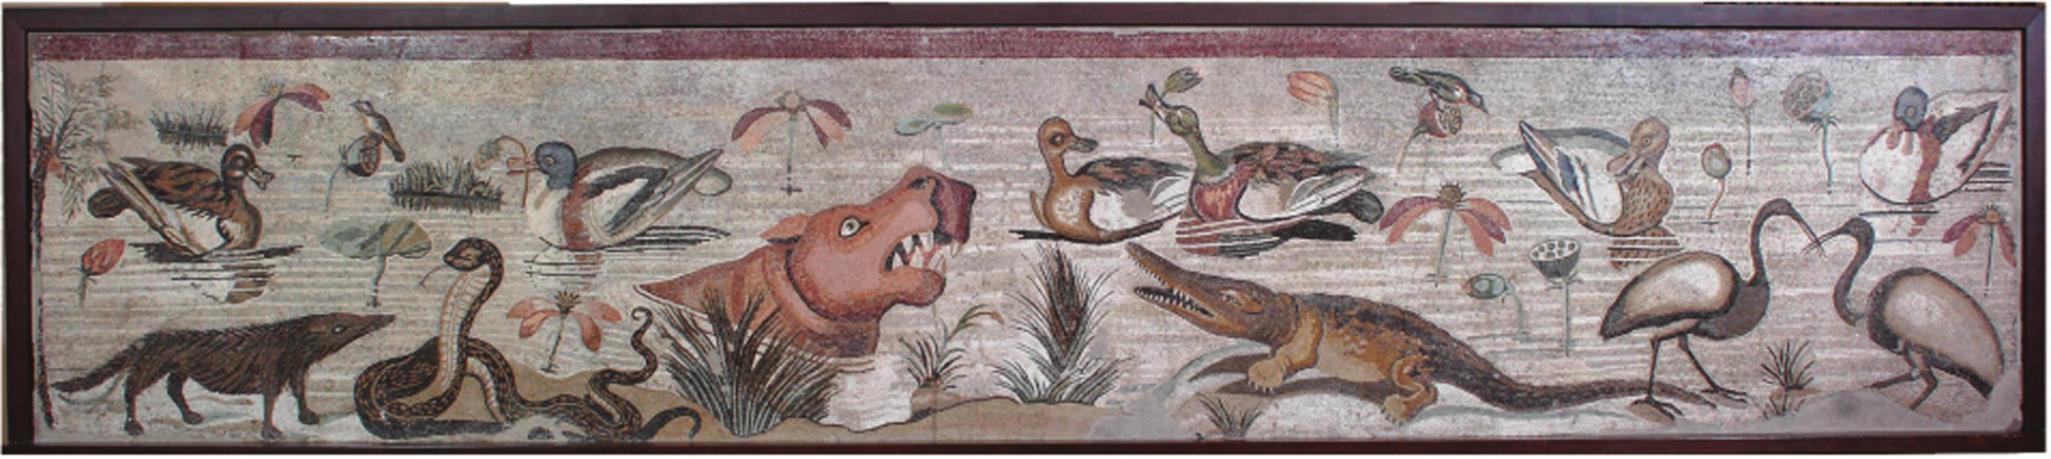 House of the Faun Nile Mosaic